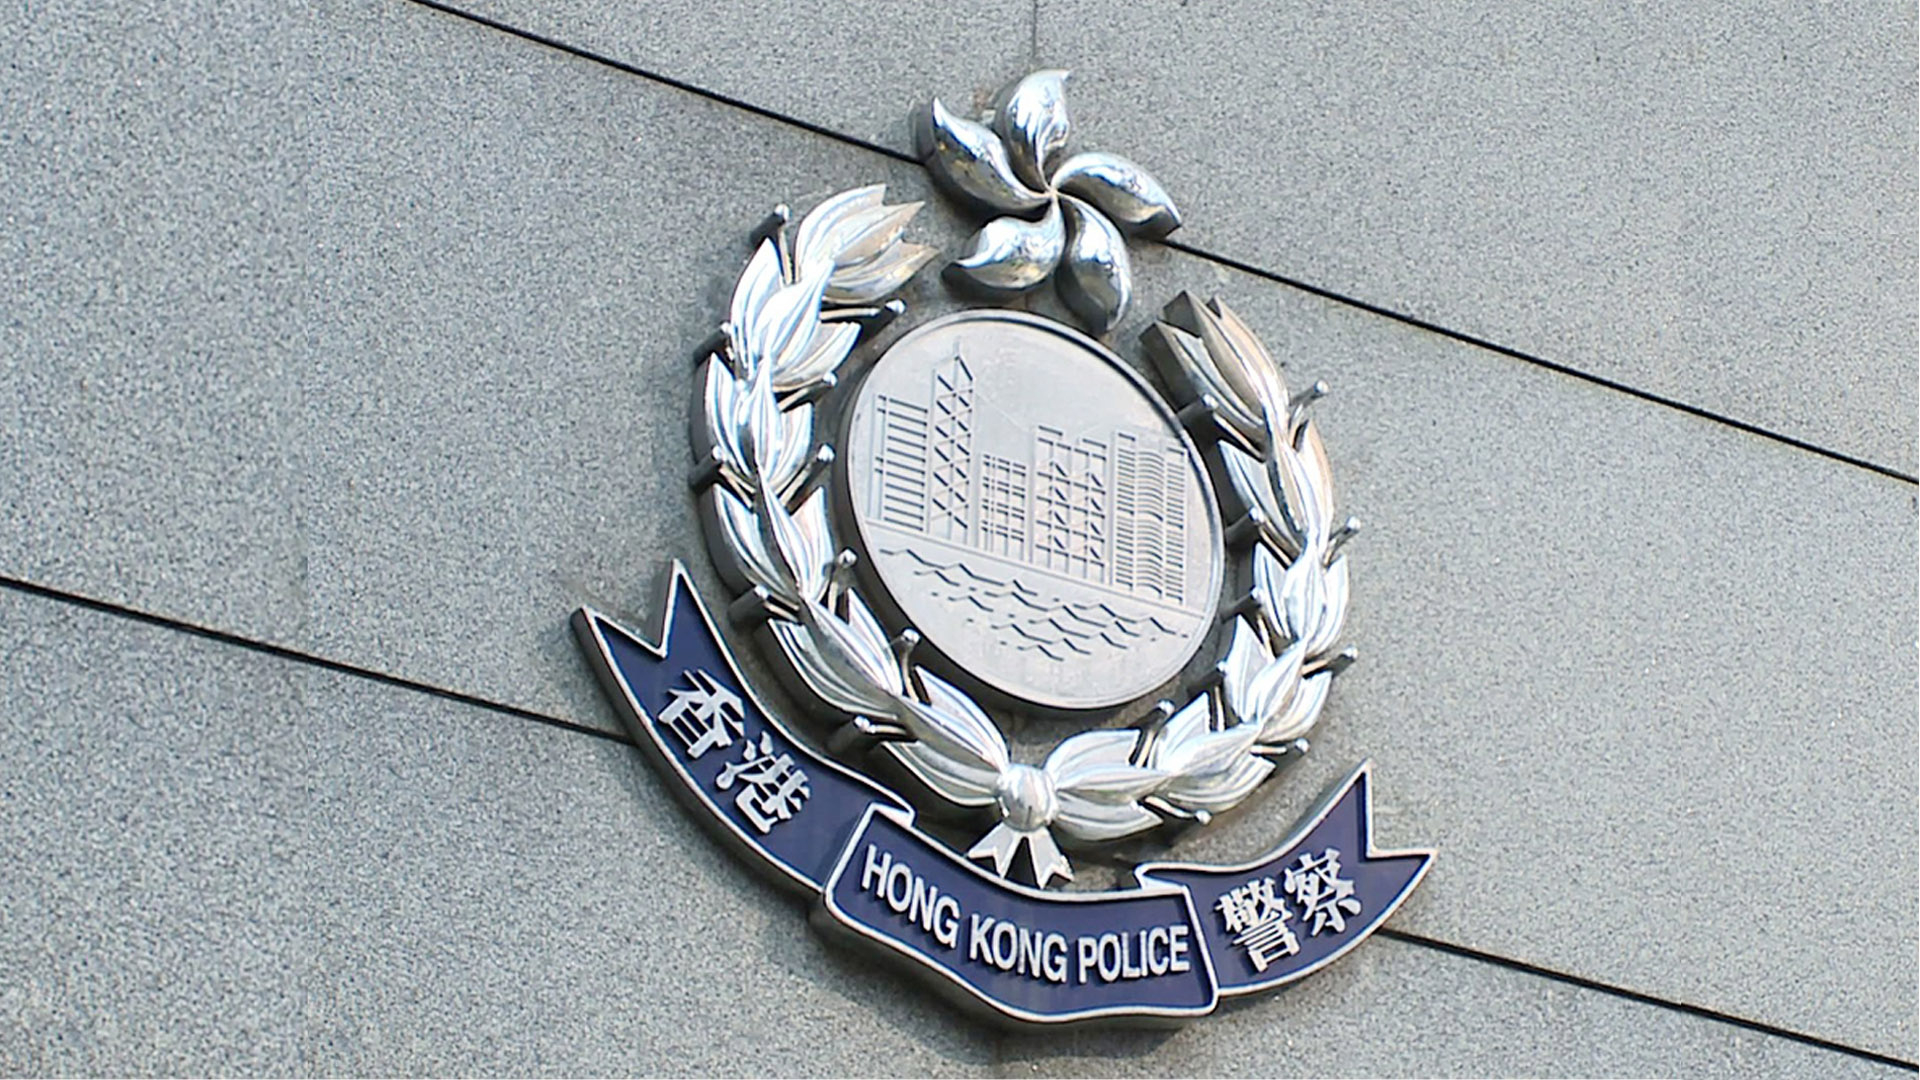 Hong Kong police arrest 53 people amid renewed violence